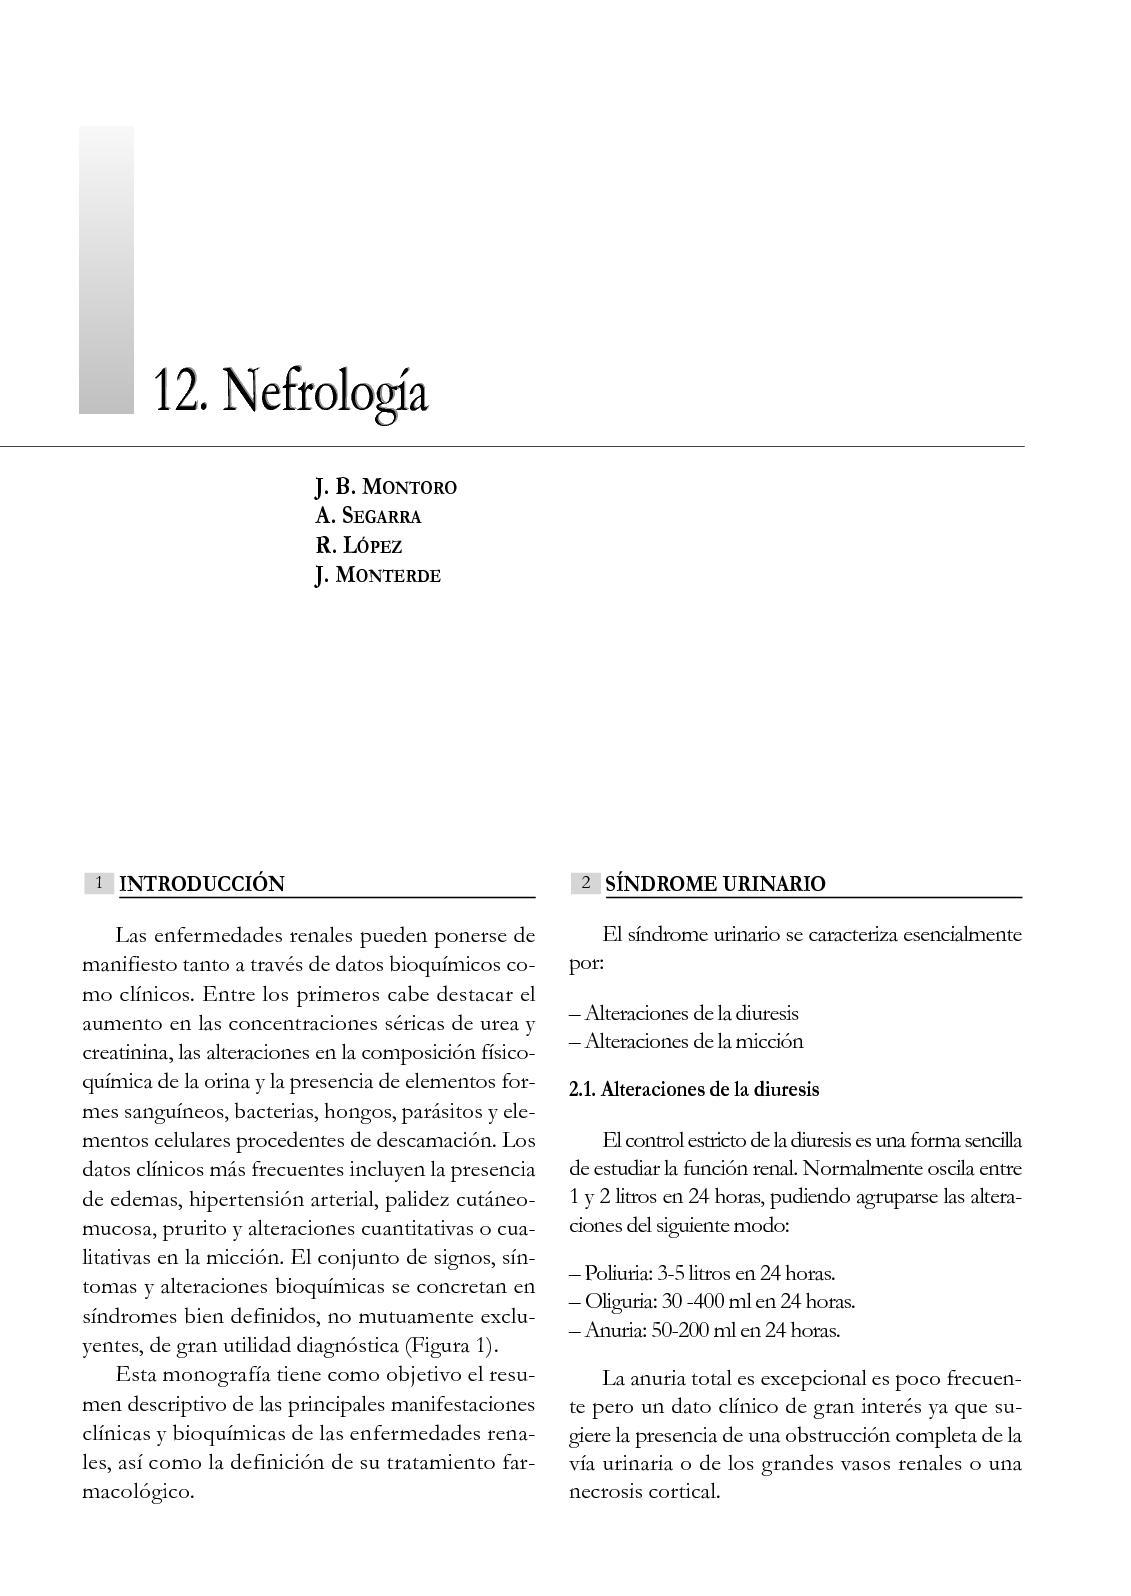 Diagnóstico de nefrosclerosis hipertensiva